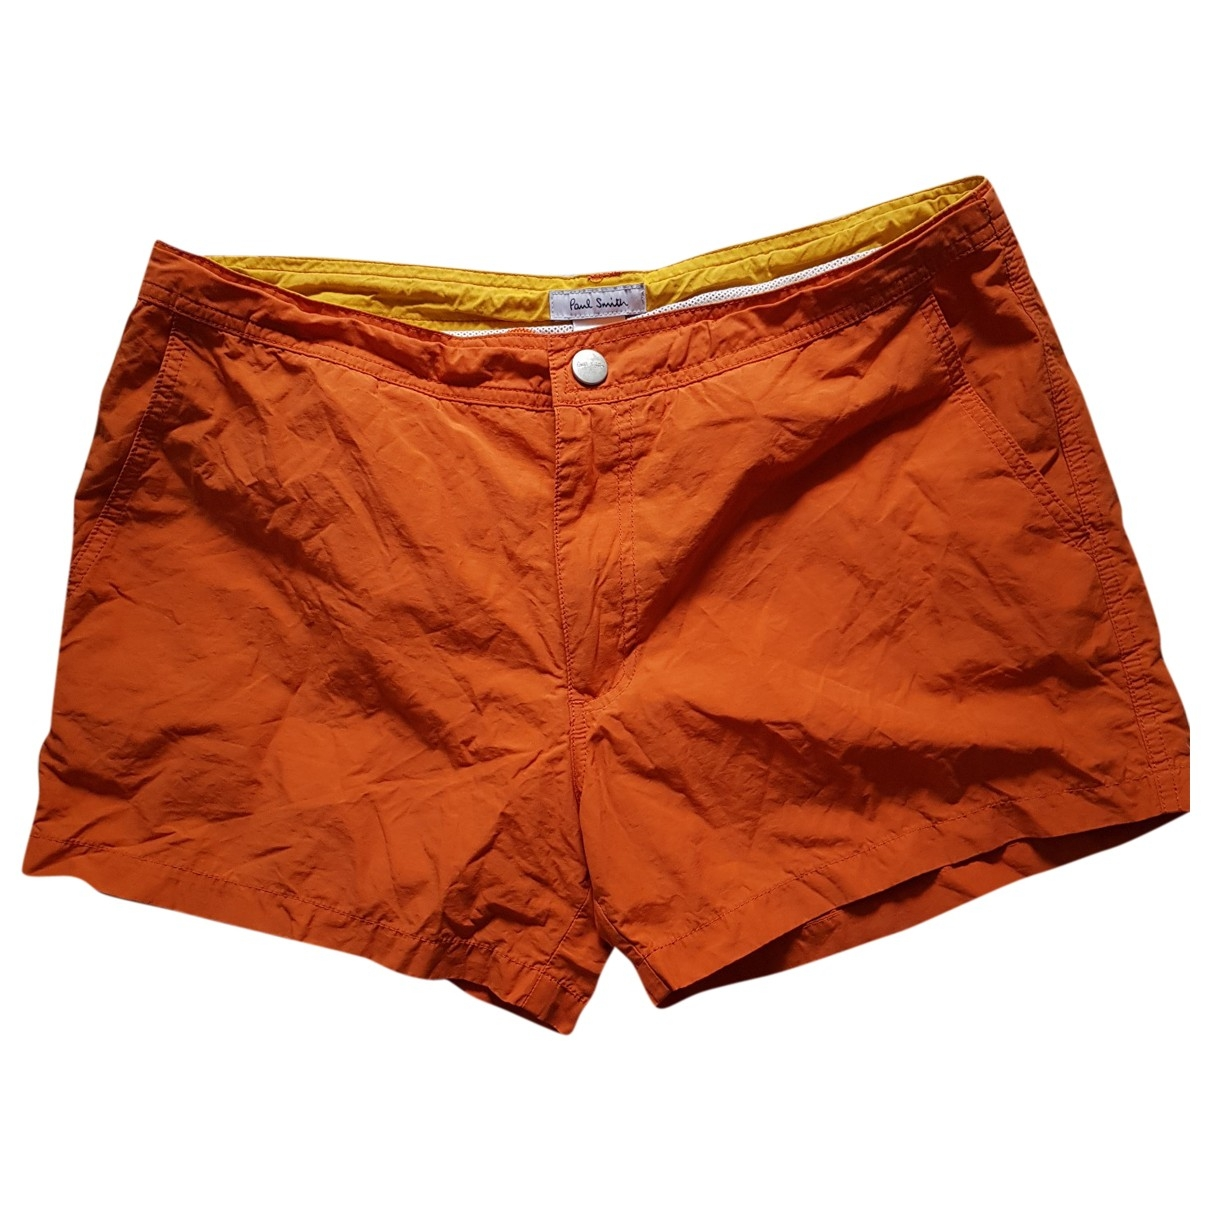 Paul Smith \N Orange Cotton - elasthane Swimwear for Men L International